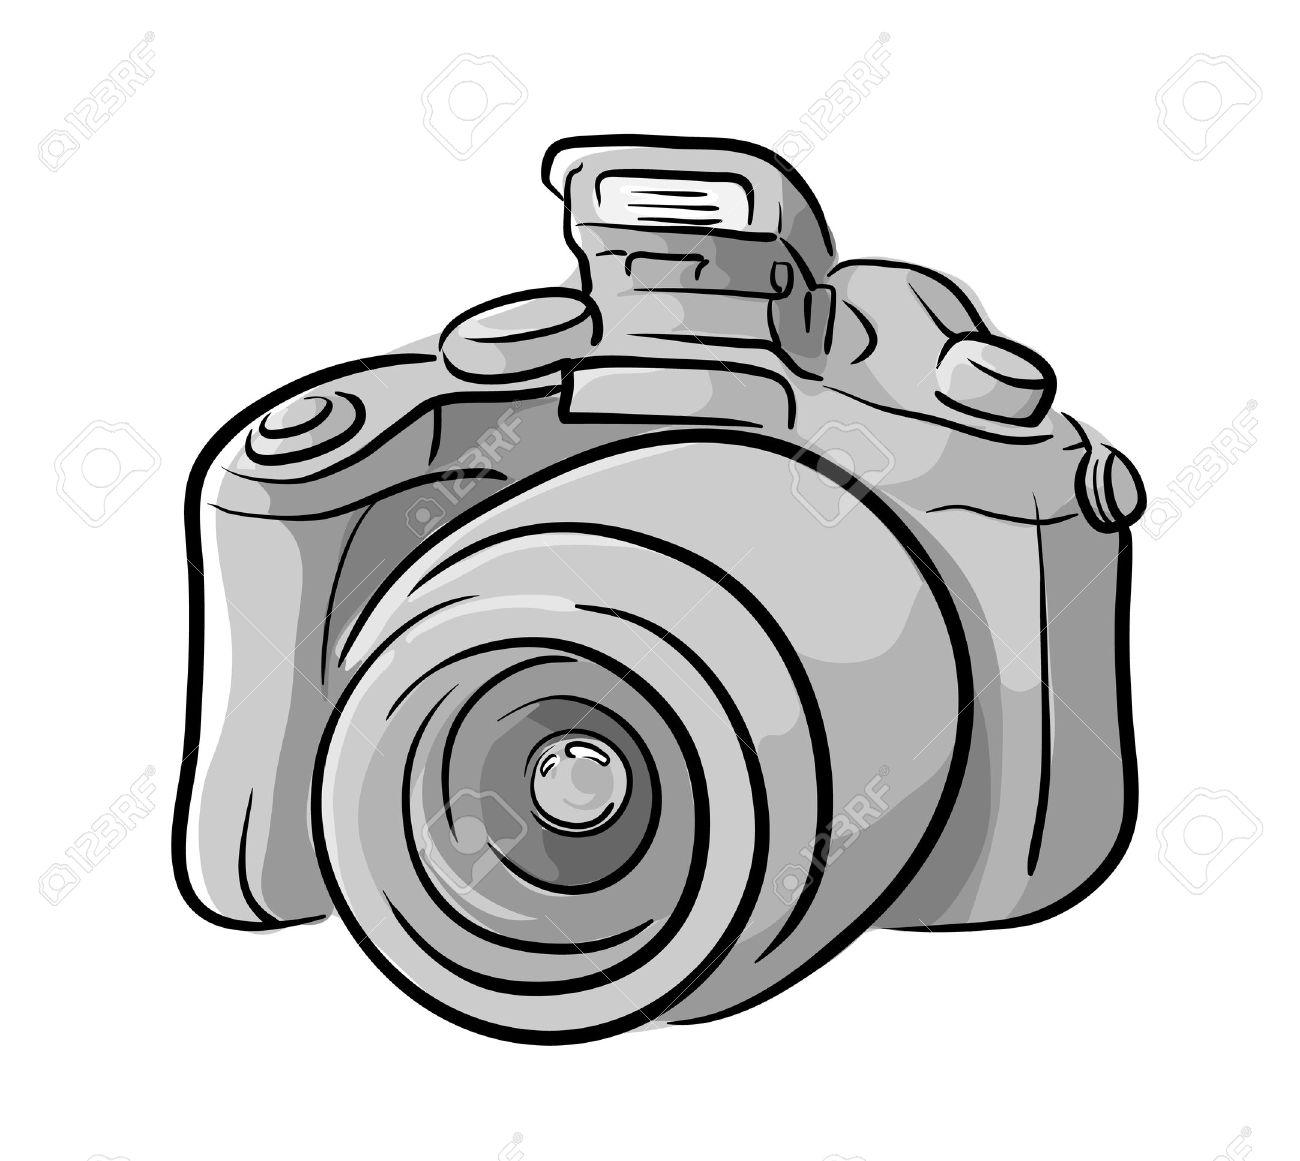 1300x1161 Dslr Camera, A Hand Drawn Vector Illustration Of A Dslr Camera